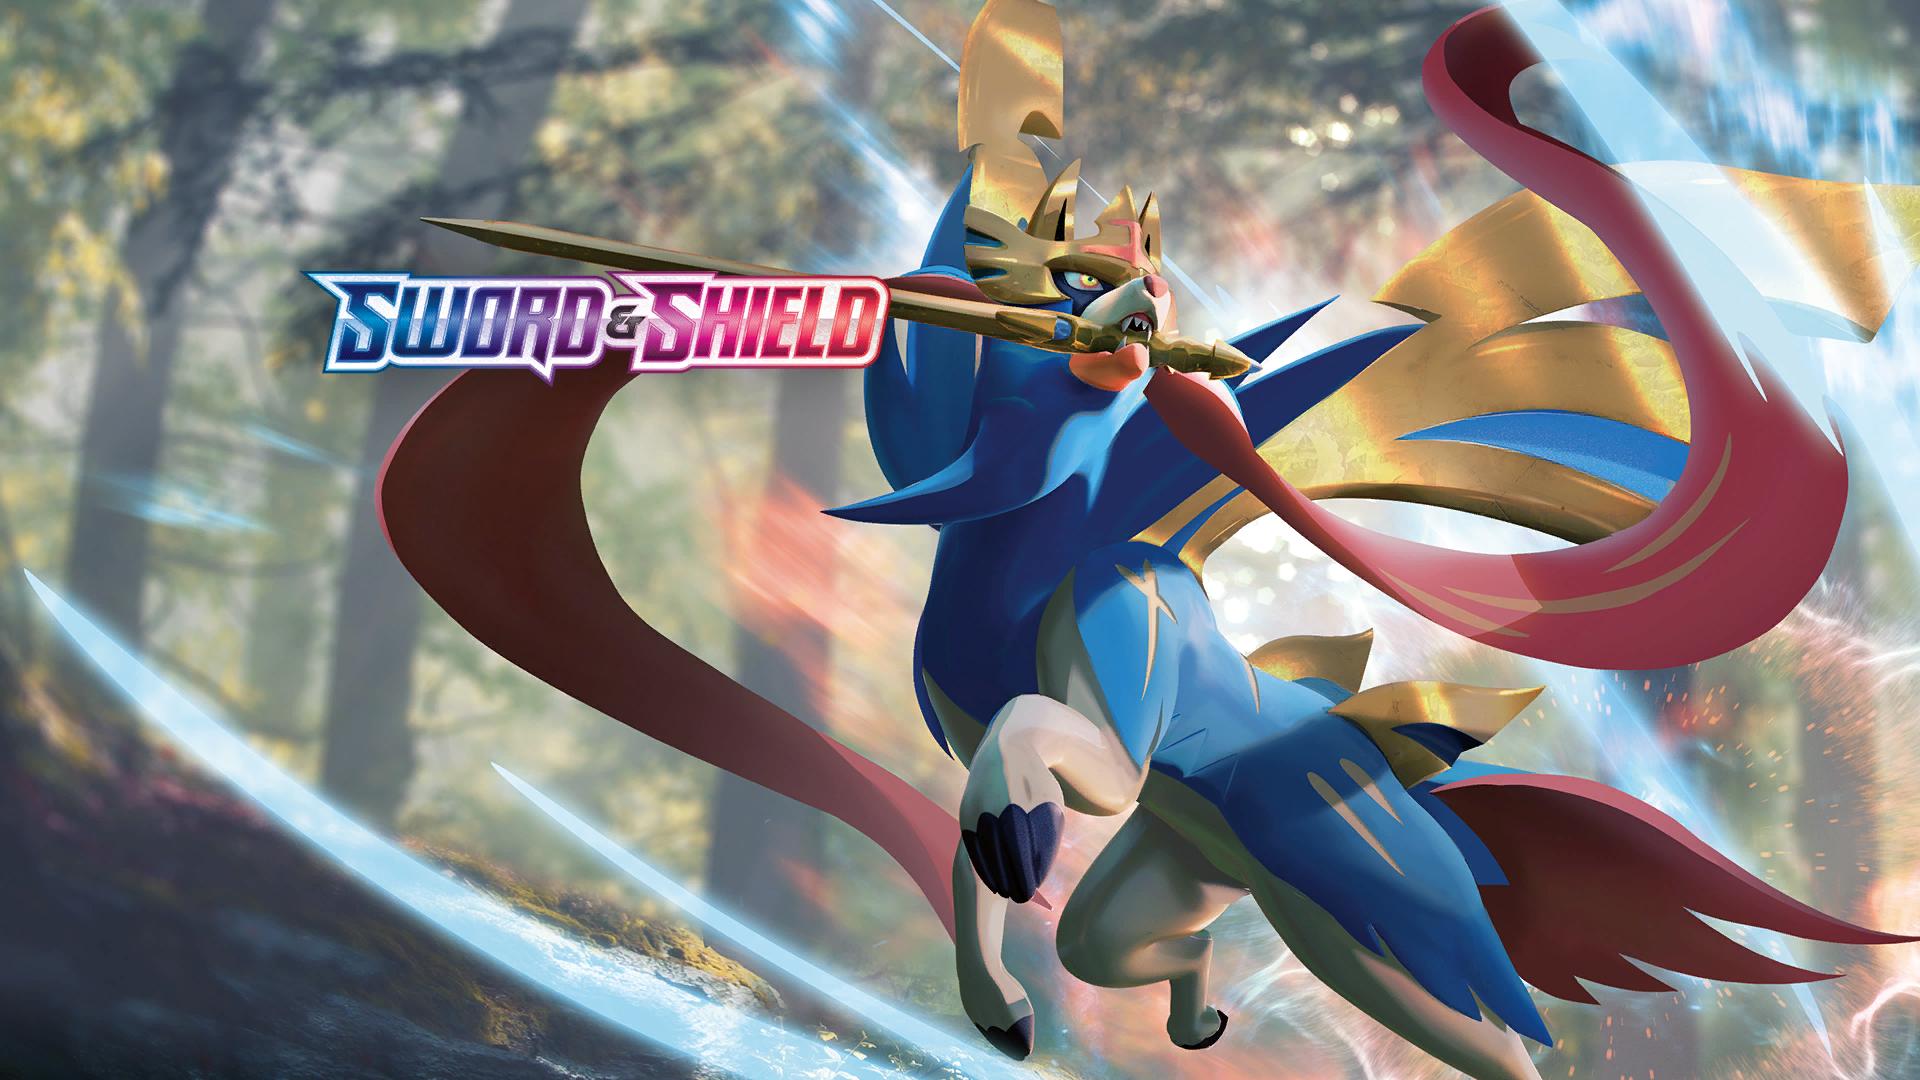 Sword Shield Tcg Artwork Early Tcgo Card Leaks Pokeguardian We Bring You The Latest Pokemon Tcg News Every Day Pokemon Artwork Pokemon Tcg